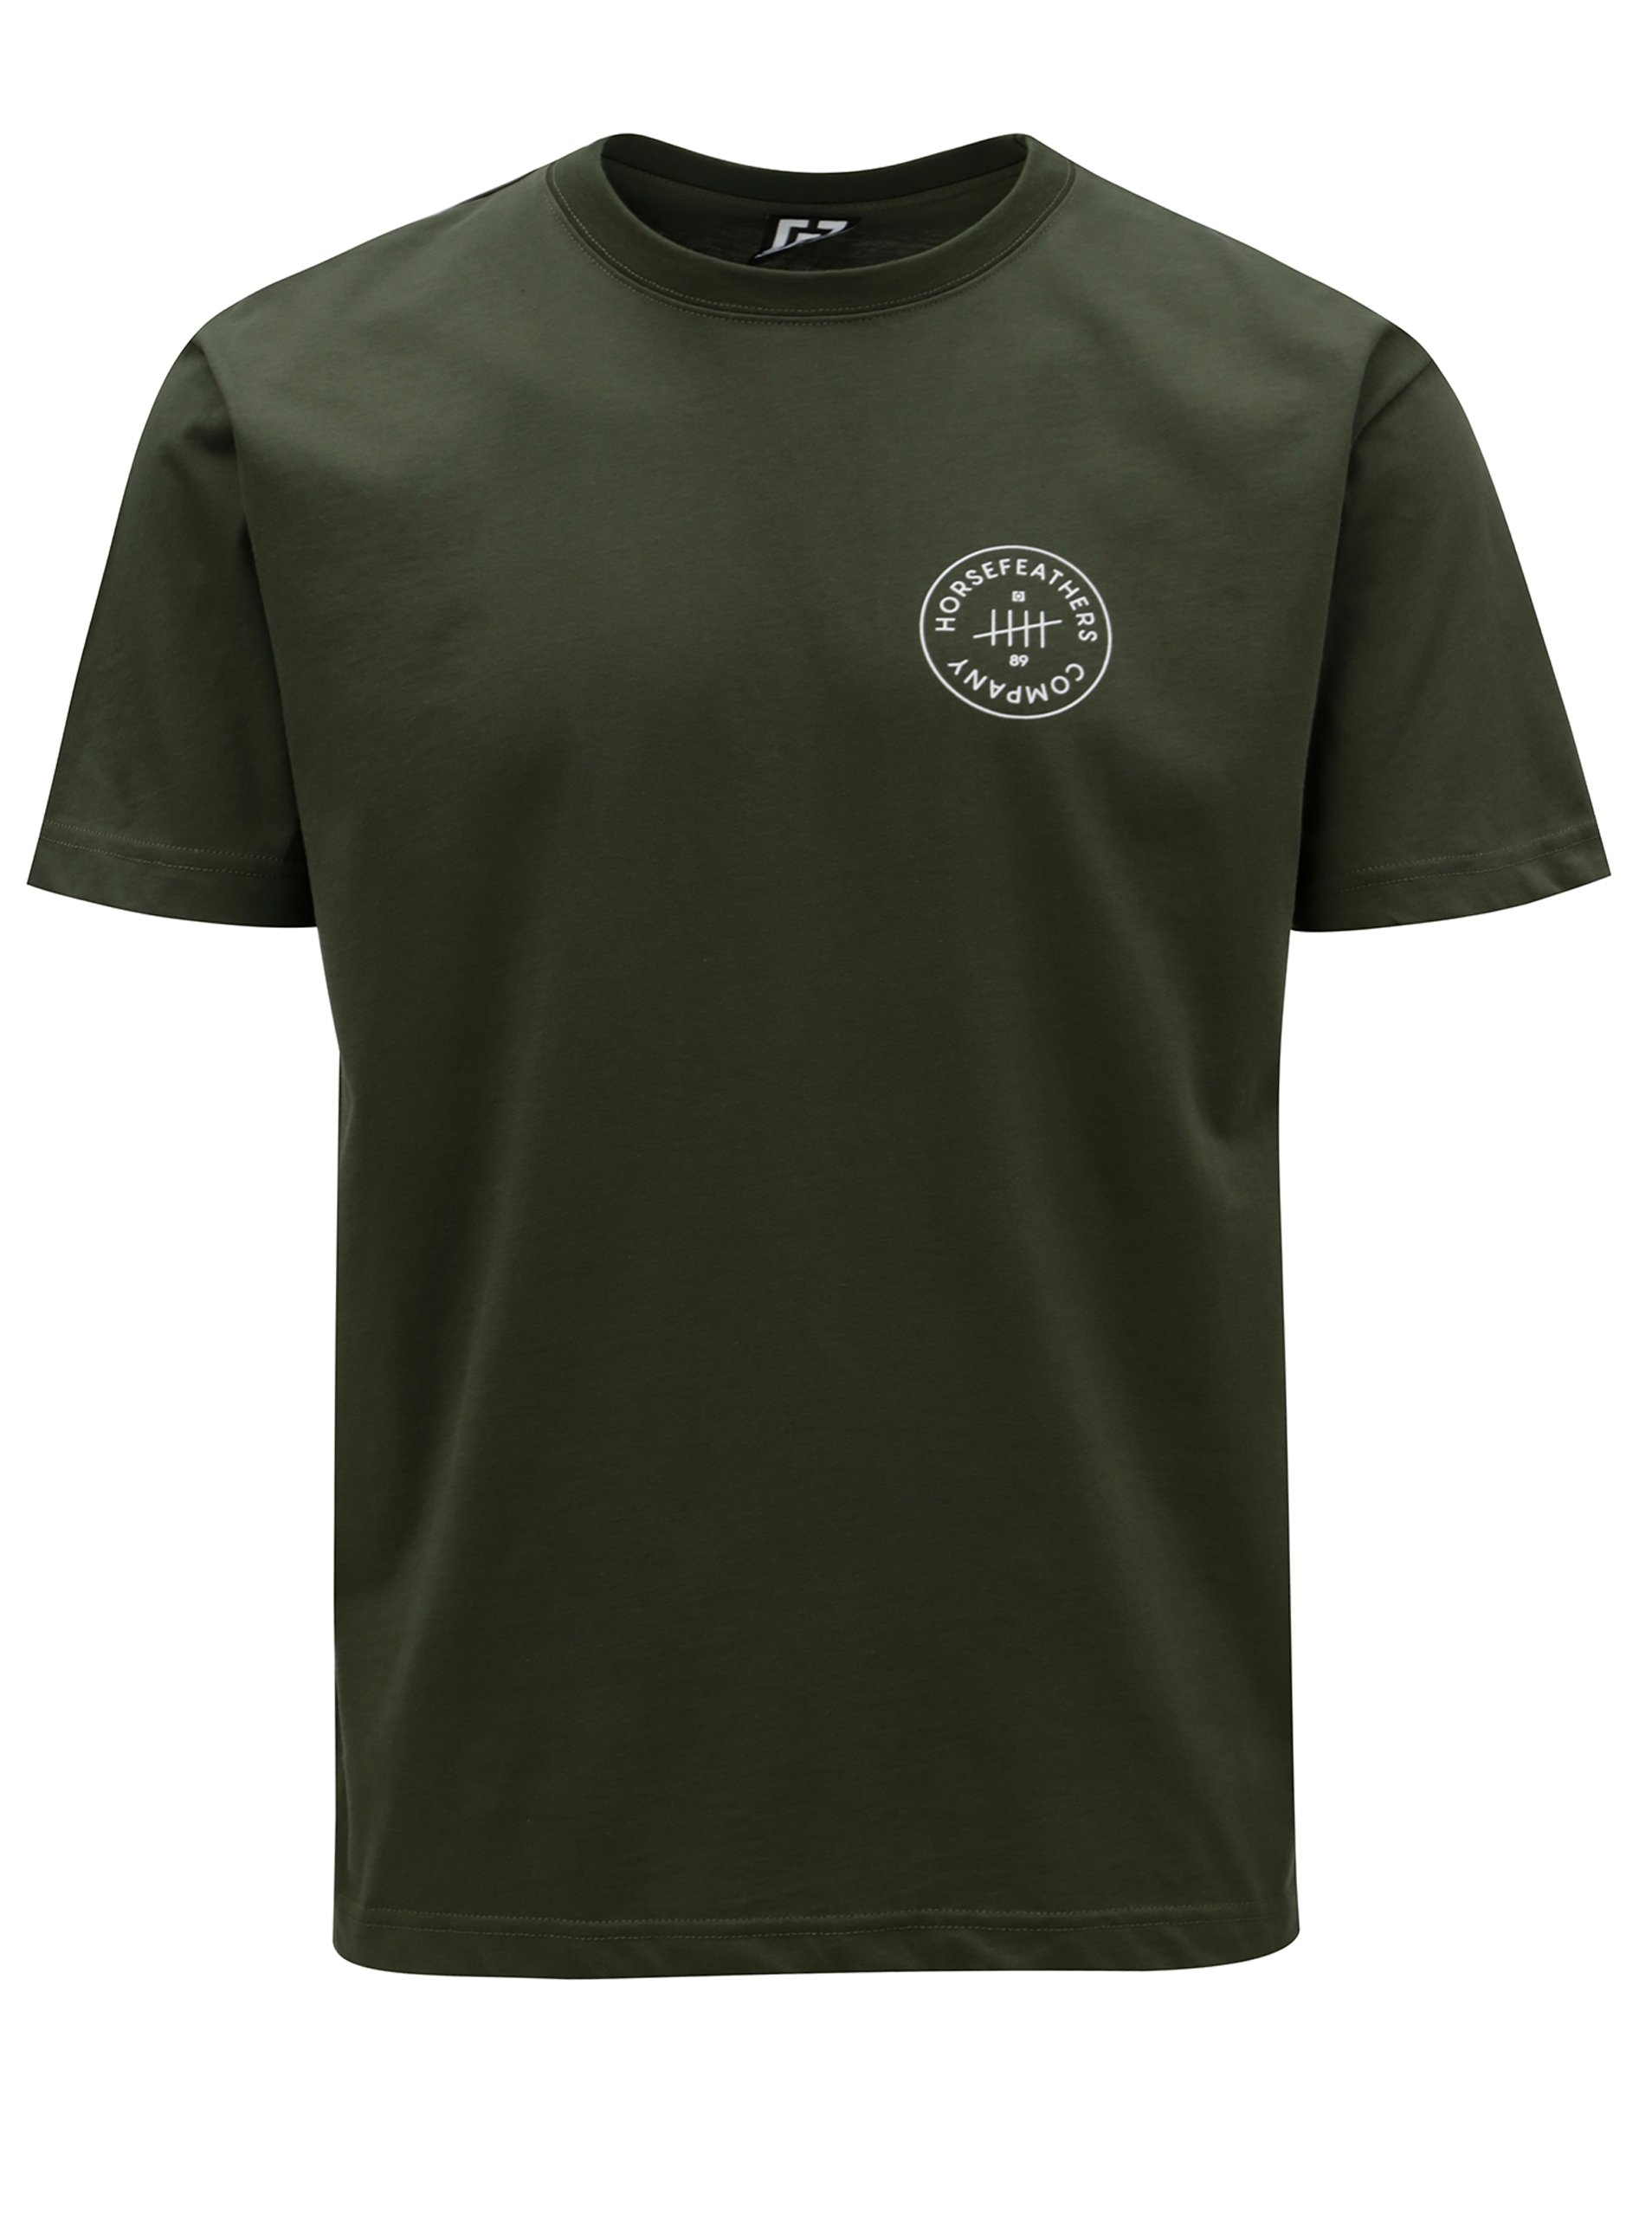 Tmavozelené pánske tričko s potlačou Horsefeathers Five